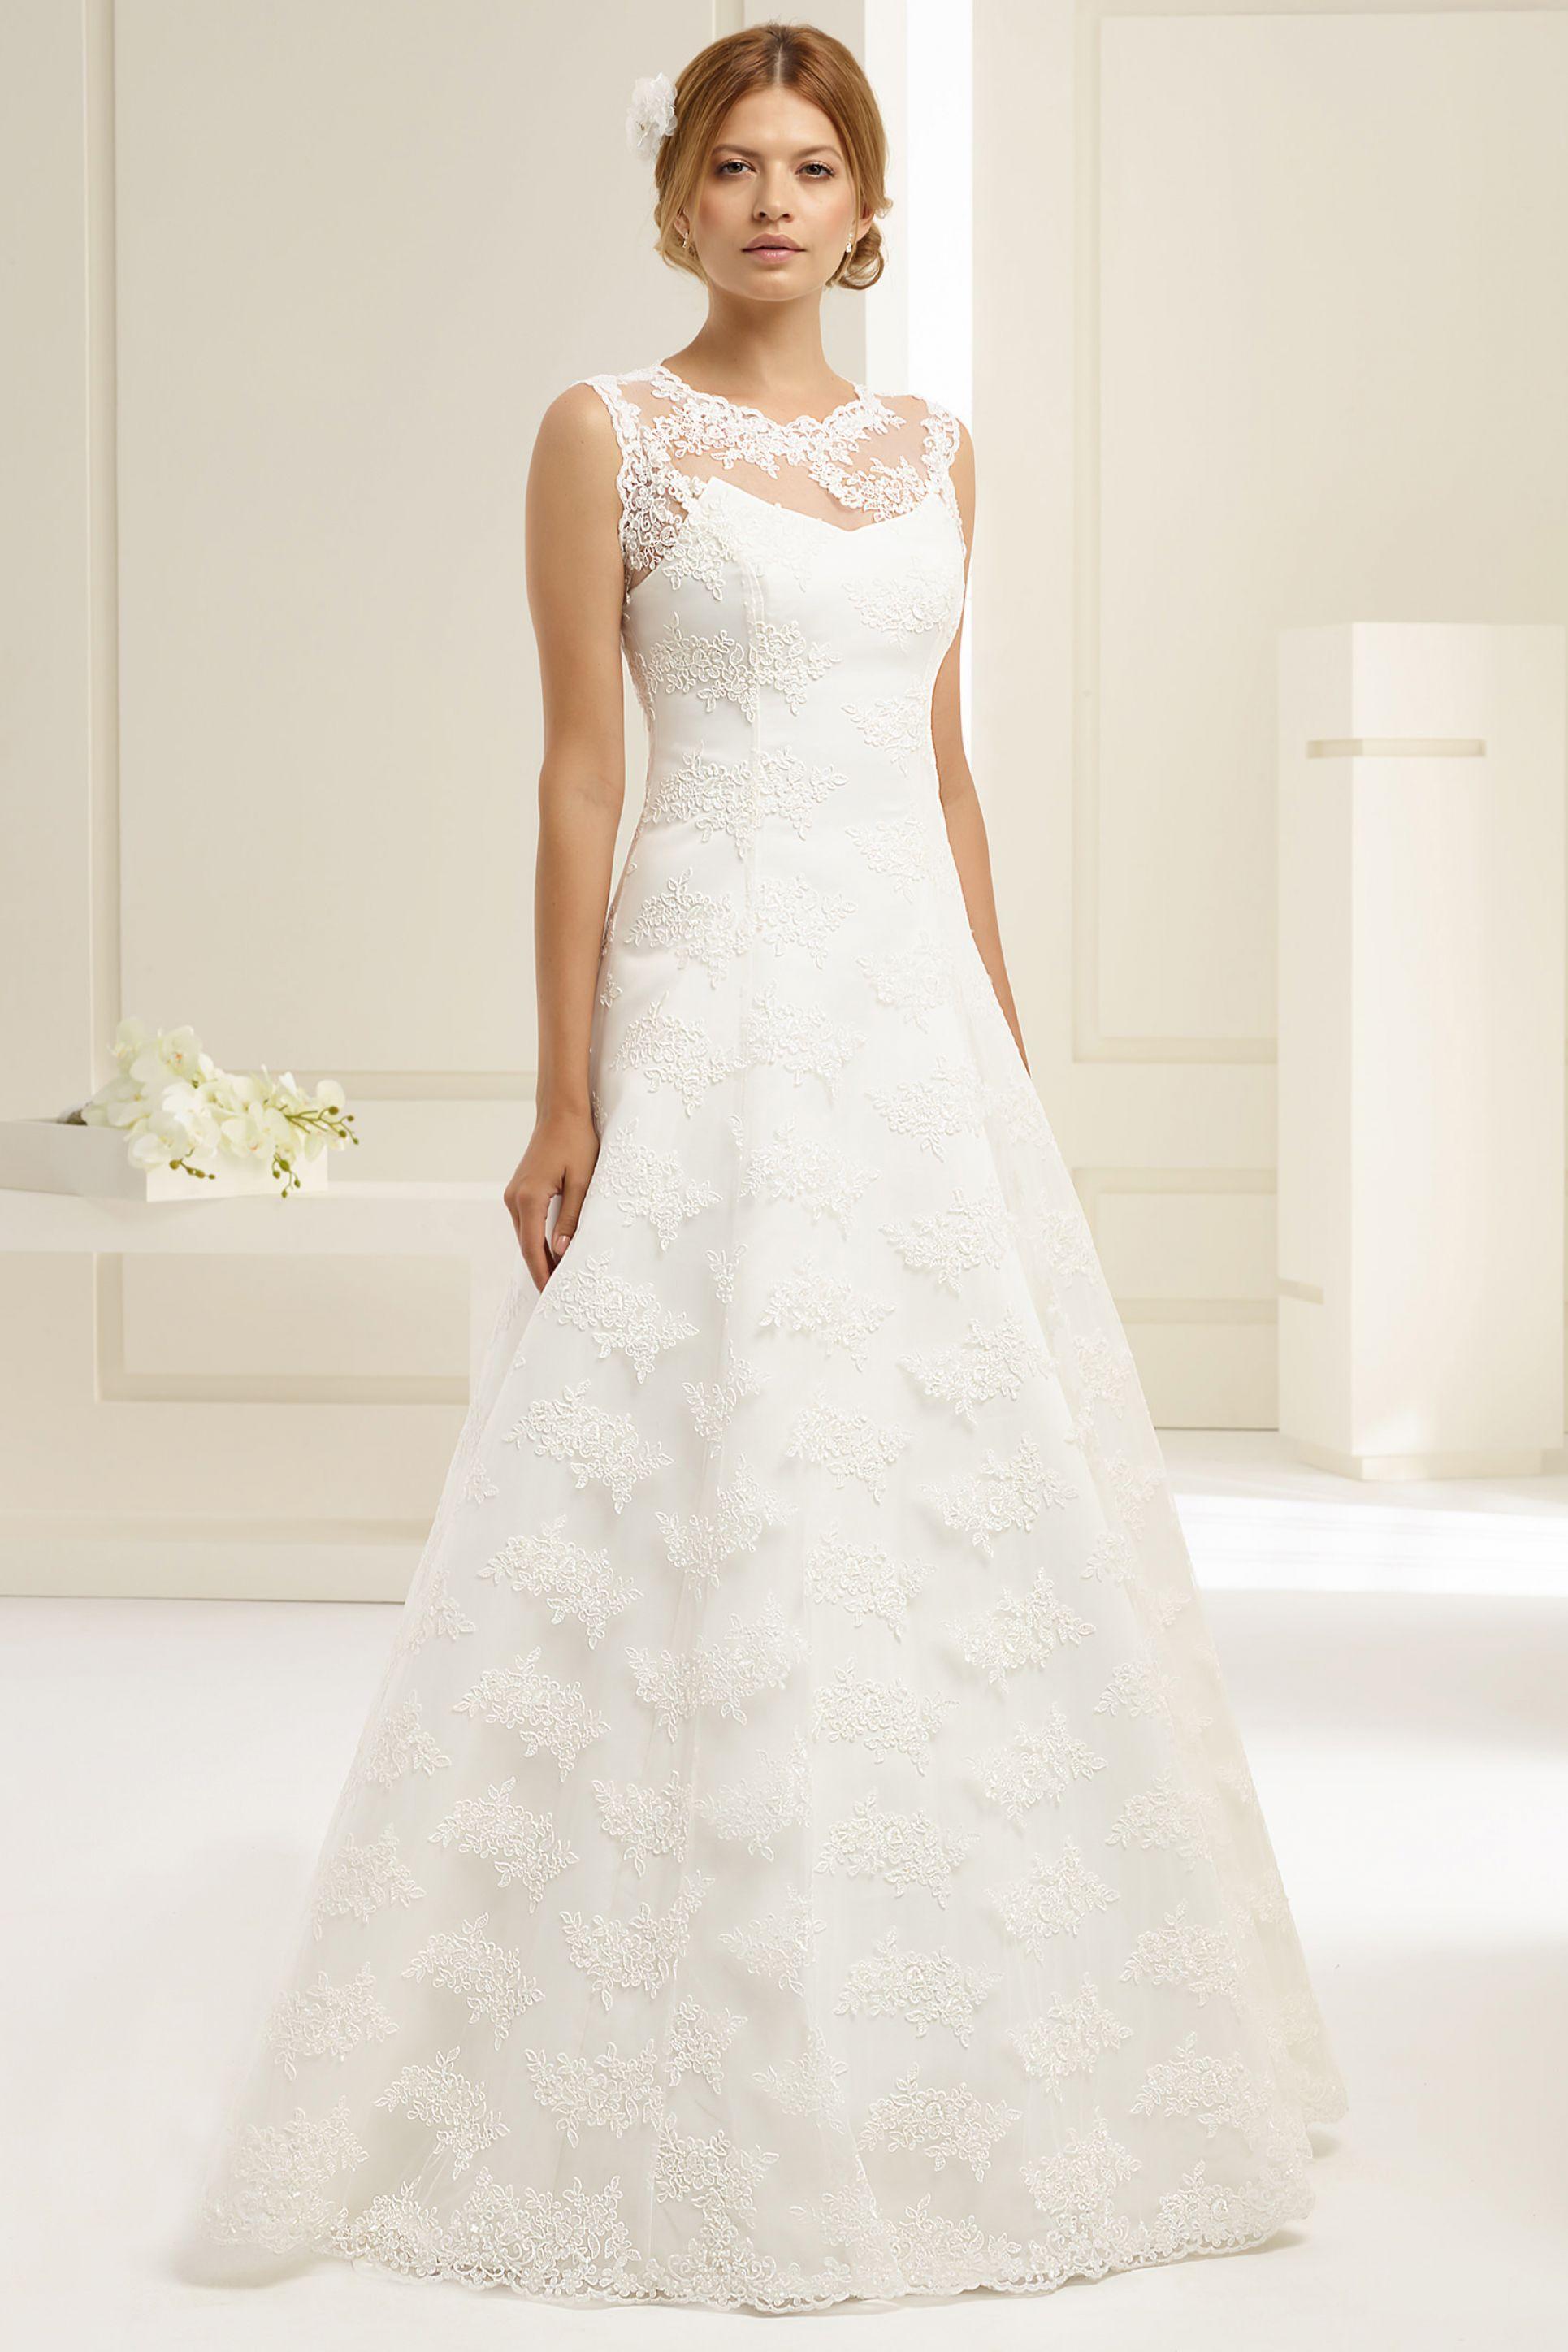 81e6b3d0ff6 Νυφικό «Liza» - Νυφικά Θρησκευτικού Γάμου   Νυφικά Είμαι Νύφη